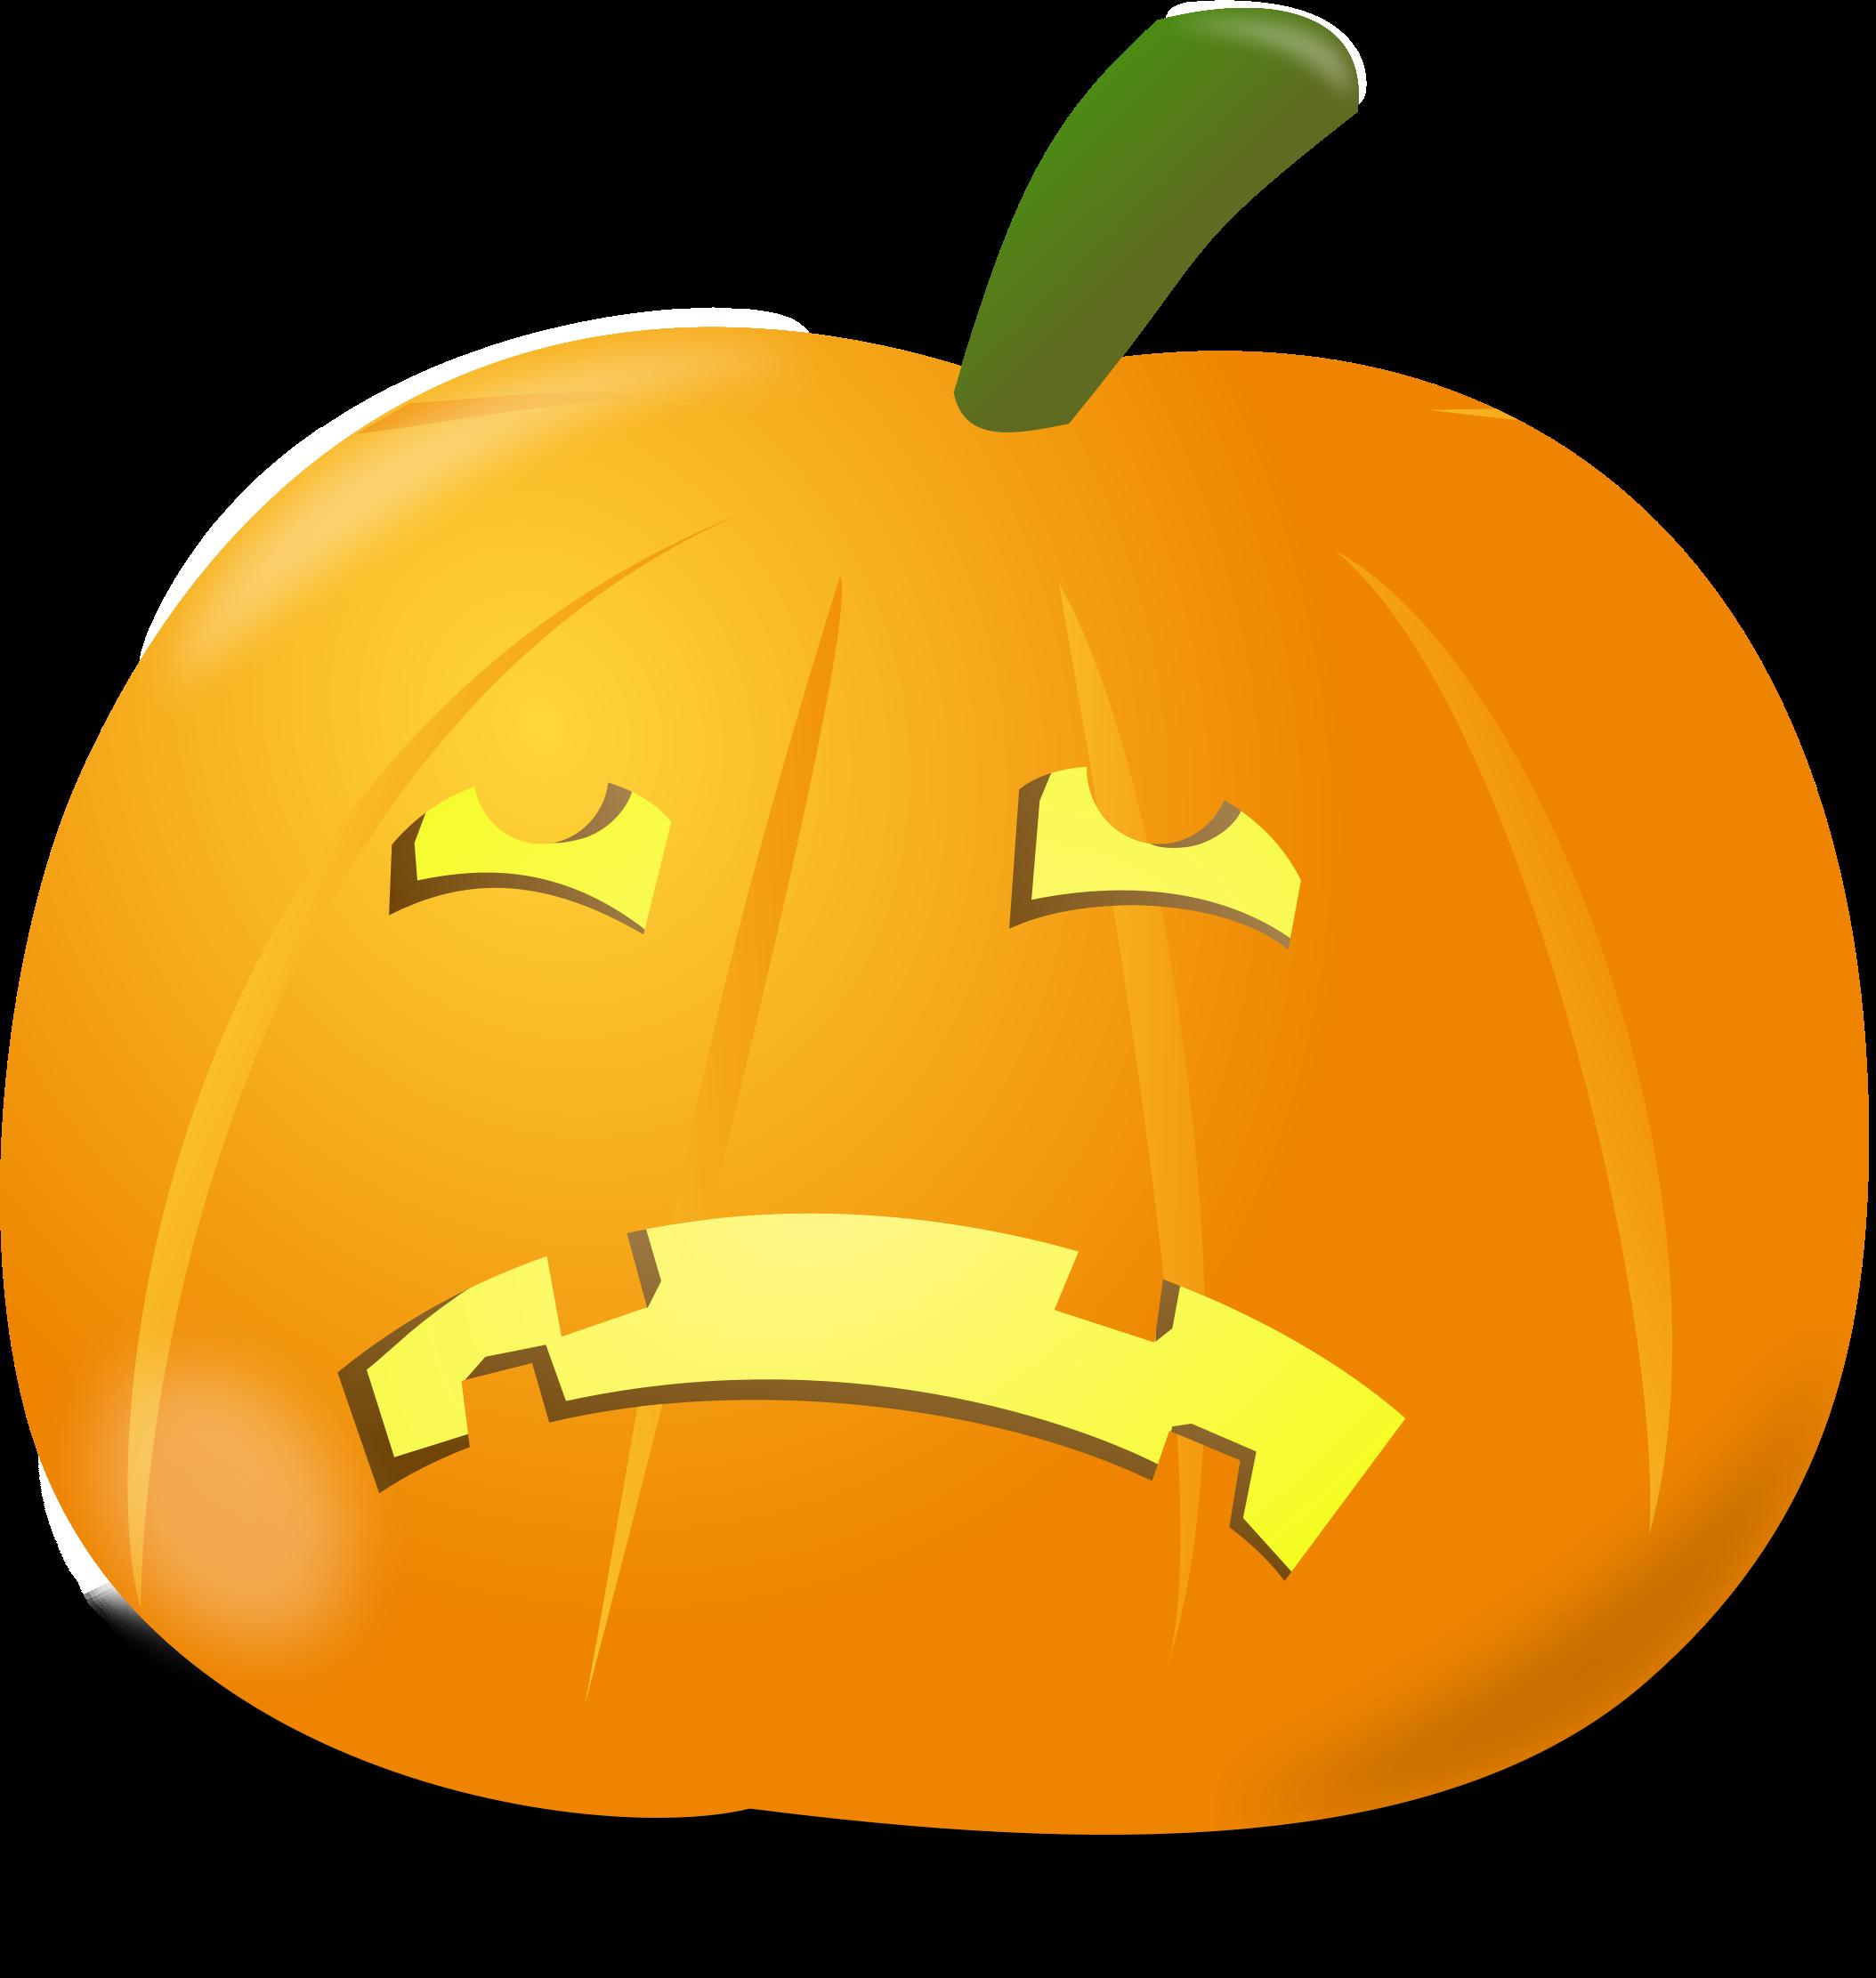 Sad pumpkin big image. Winter clipart fruit